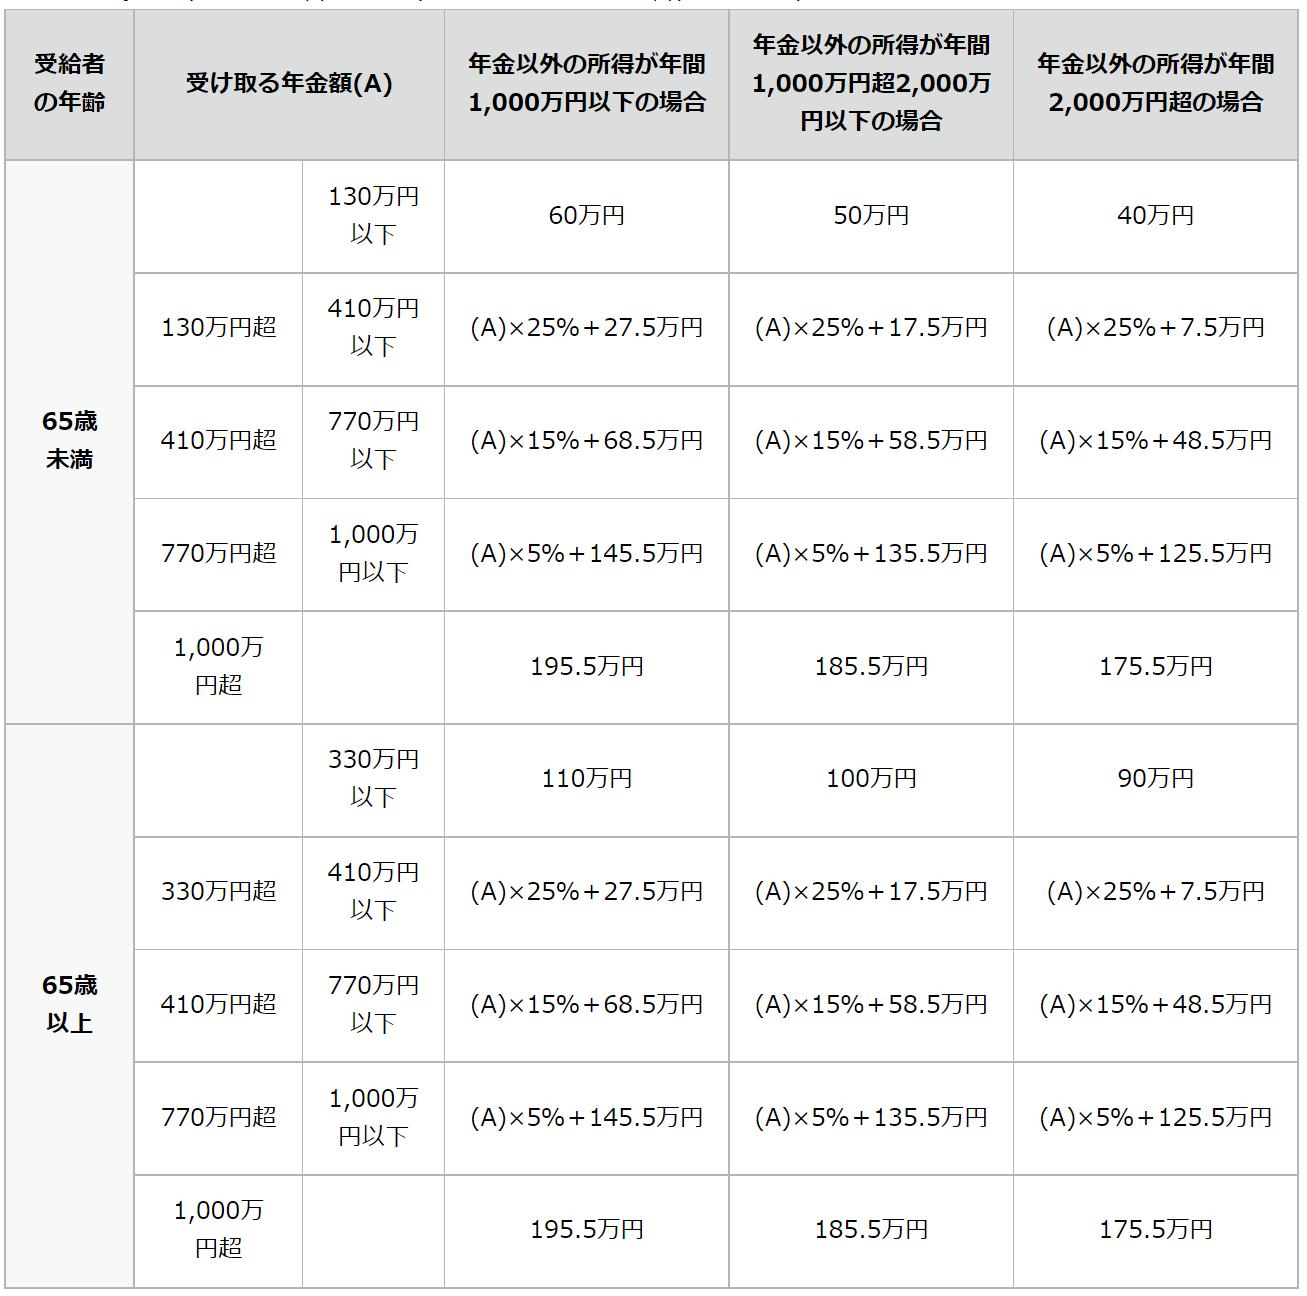 公的年金等控除額の表